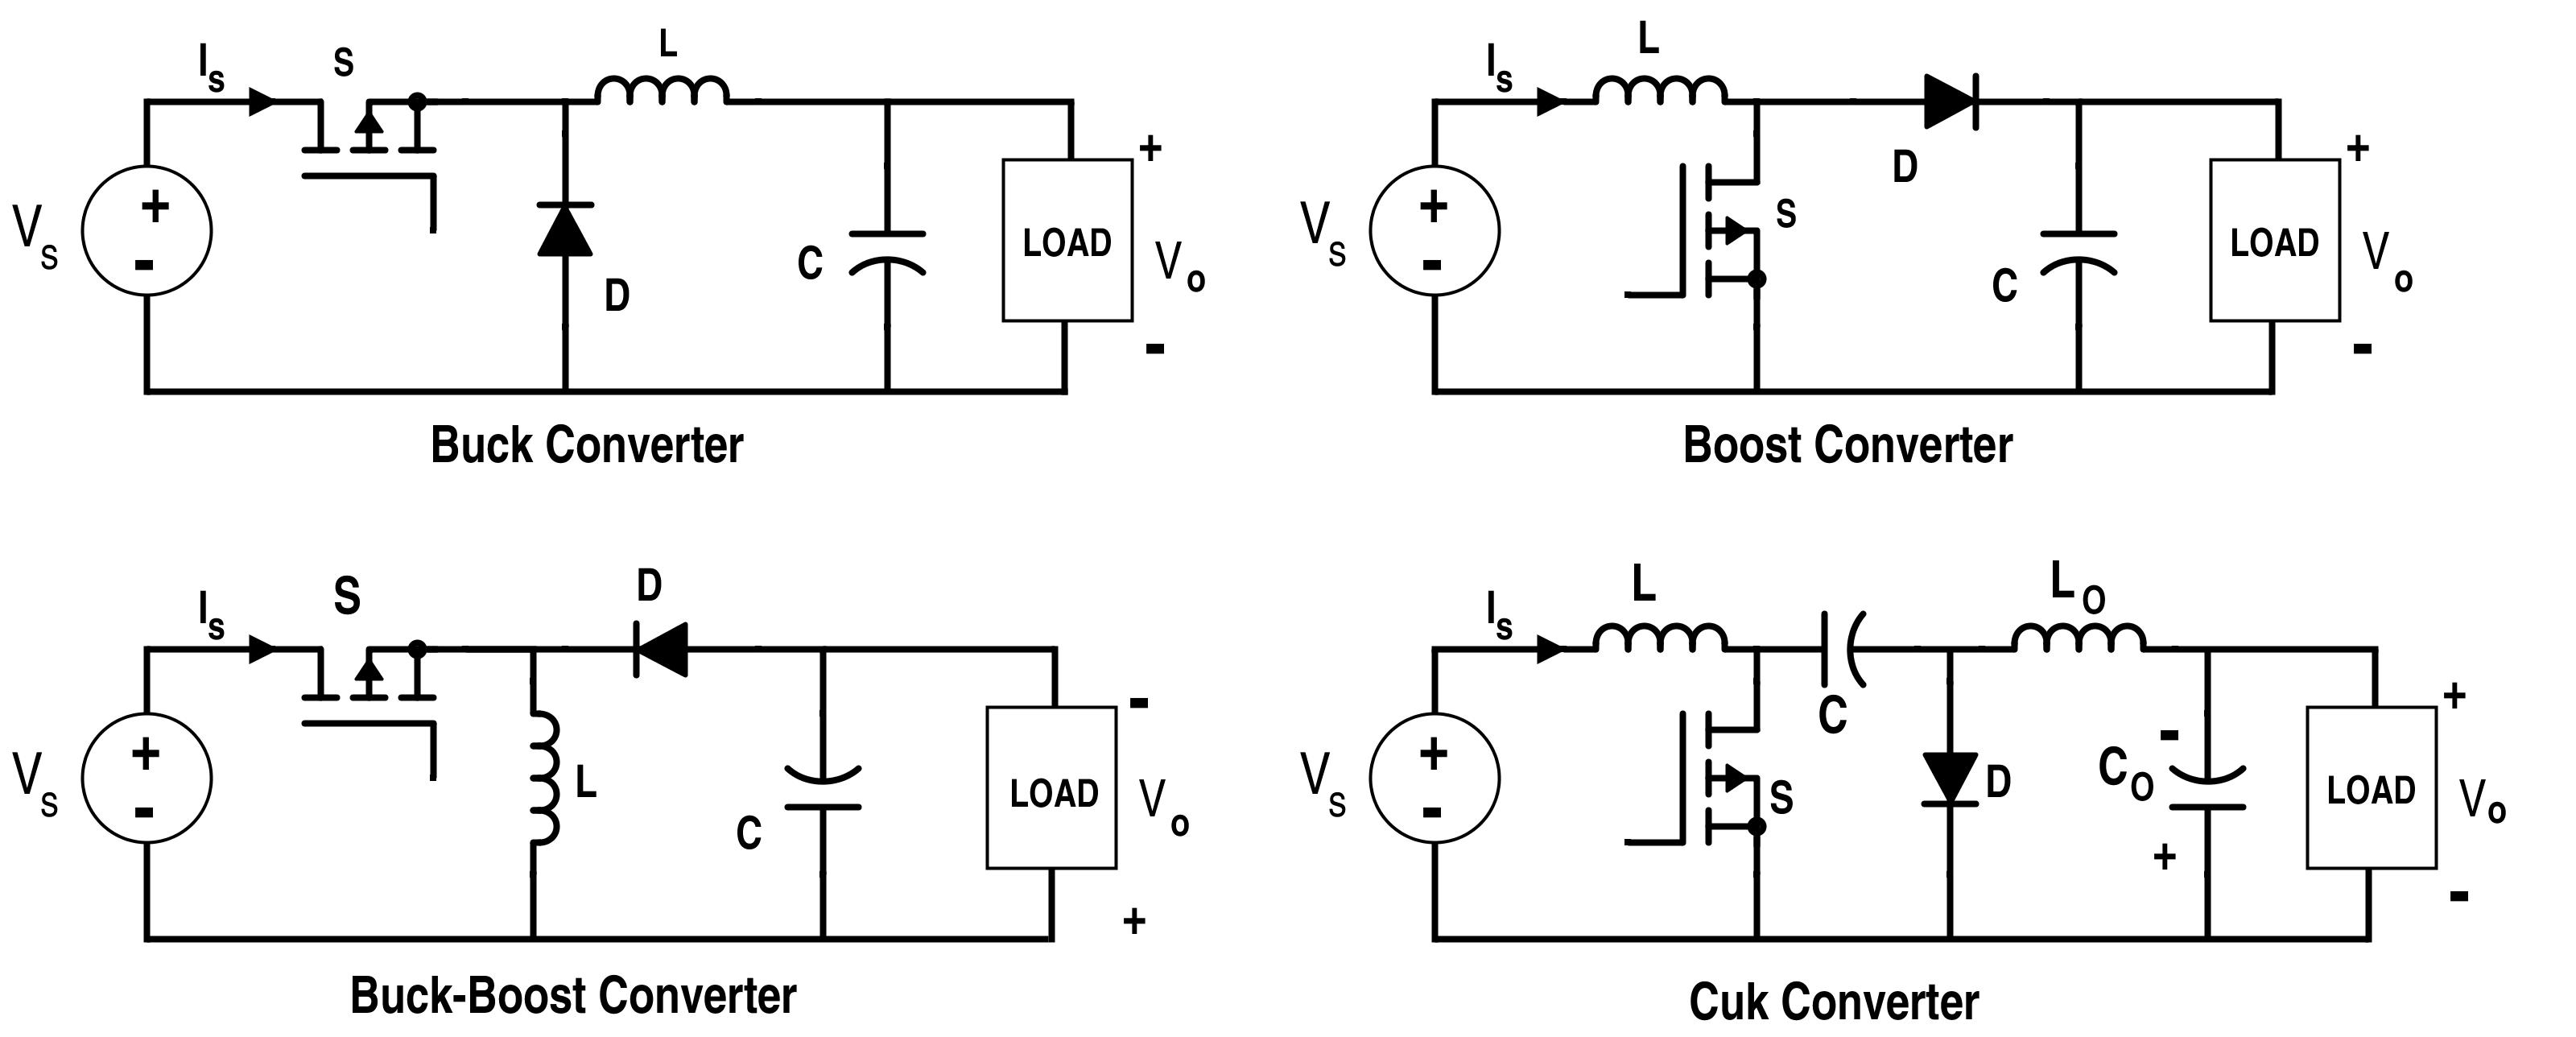 dc dc buck converter schematic